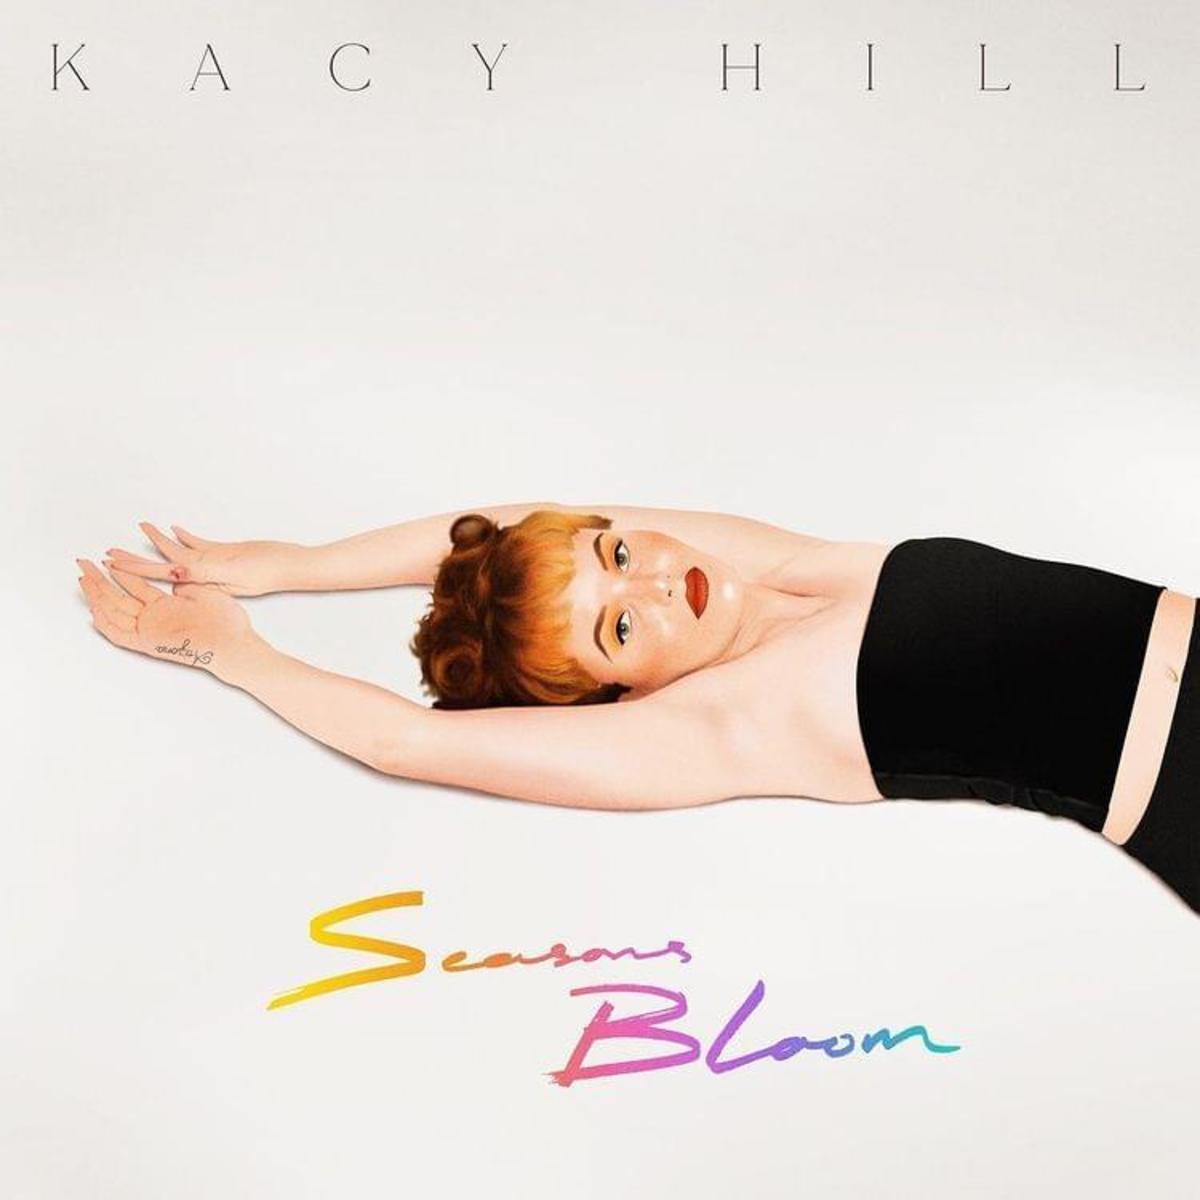 MP3: Kacy Hill - Seasons Bloom